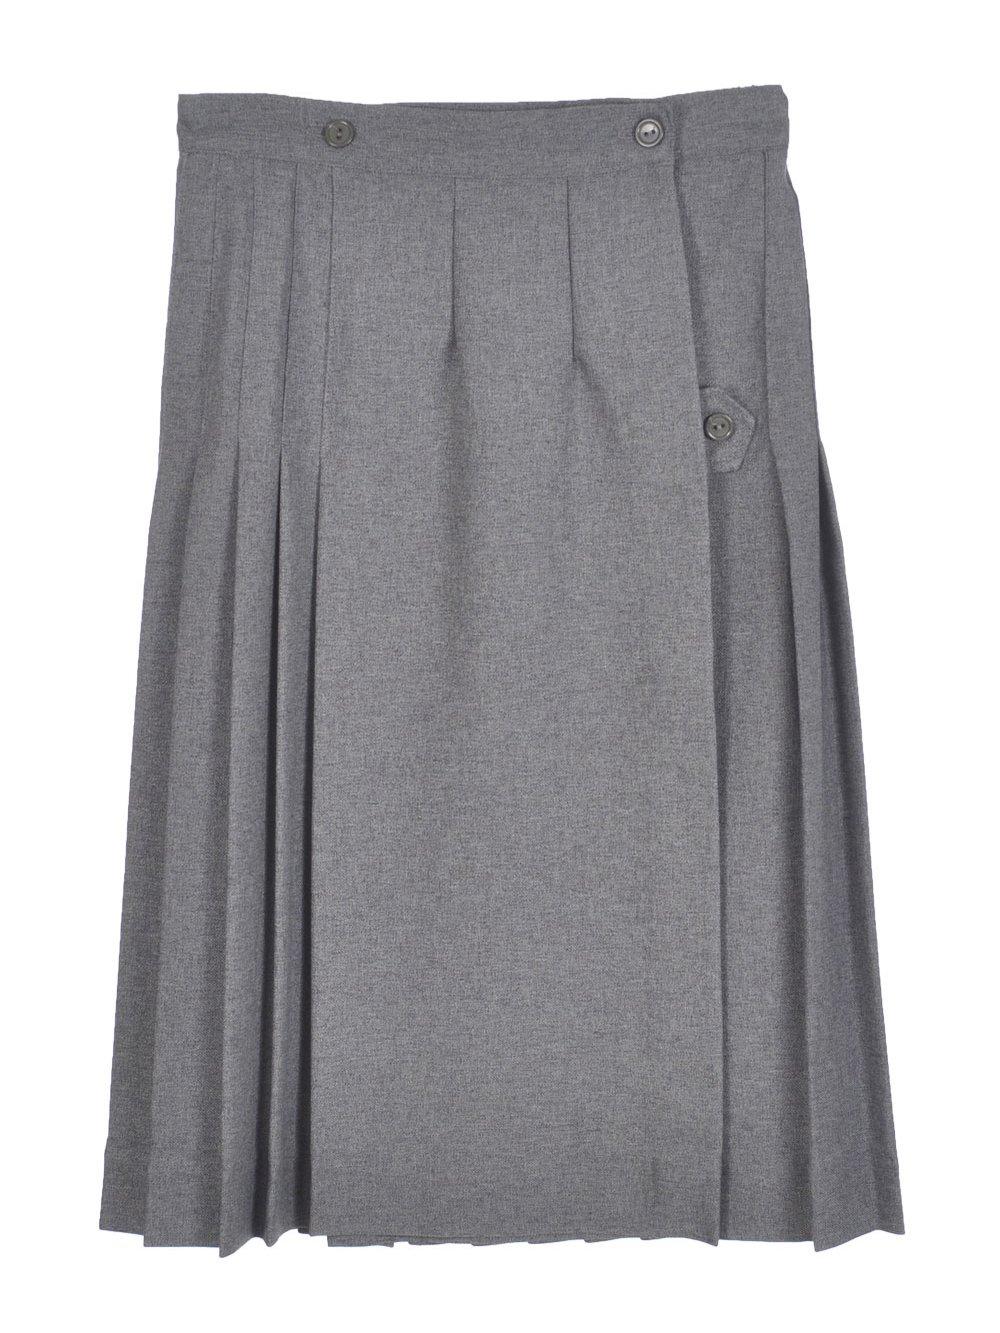 Cookie's Brand Big Girls' Junior''Half Pleat'' Skirt - gray, junior 13